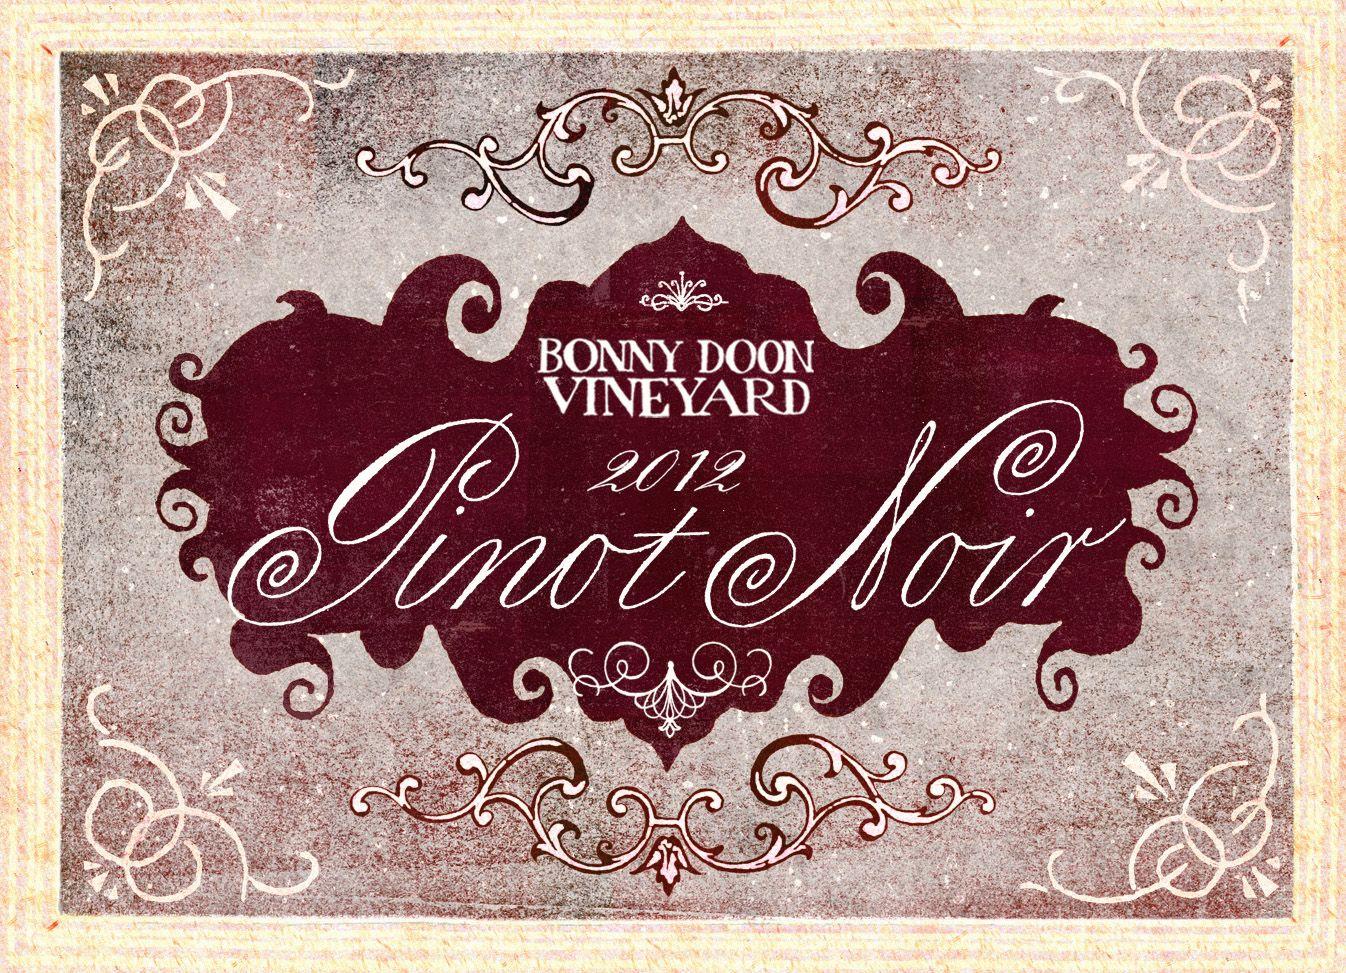 2012 Pinot Noir Spanish Springs Label Art By Grady Mcferrin Bonnydoonvineyard Wine Http Shop Bonnydoonvineyard Com Index Cfm Met Pinot Noir Noir Pinot